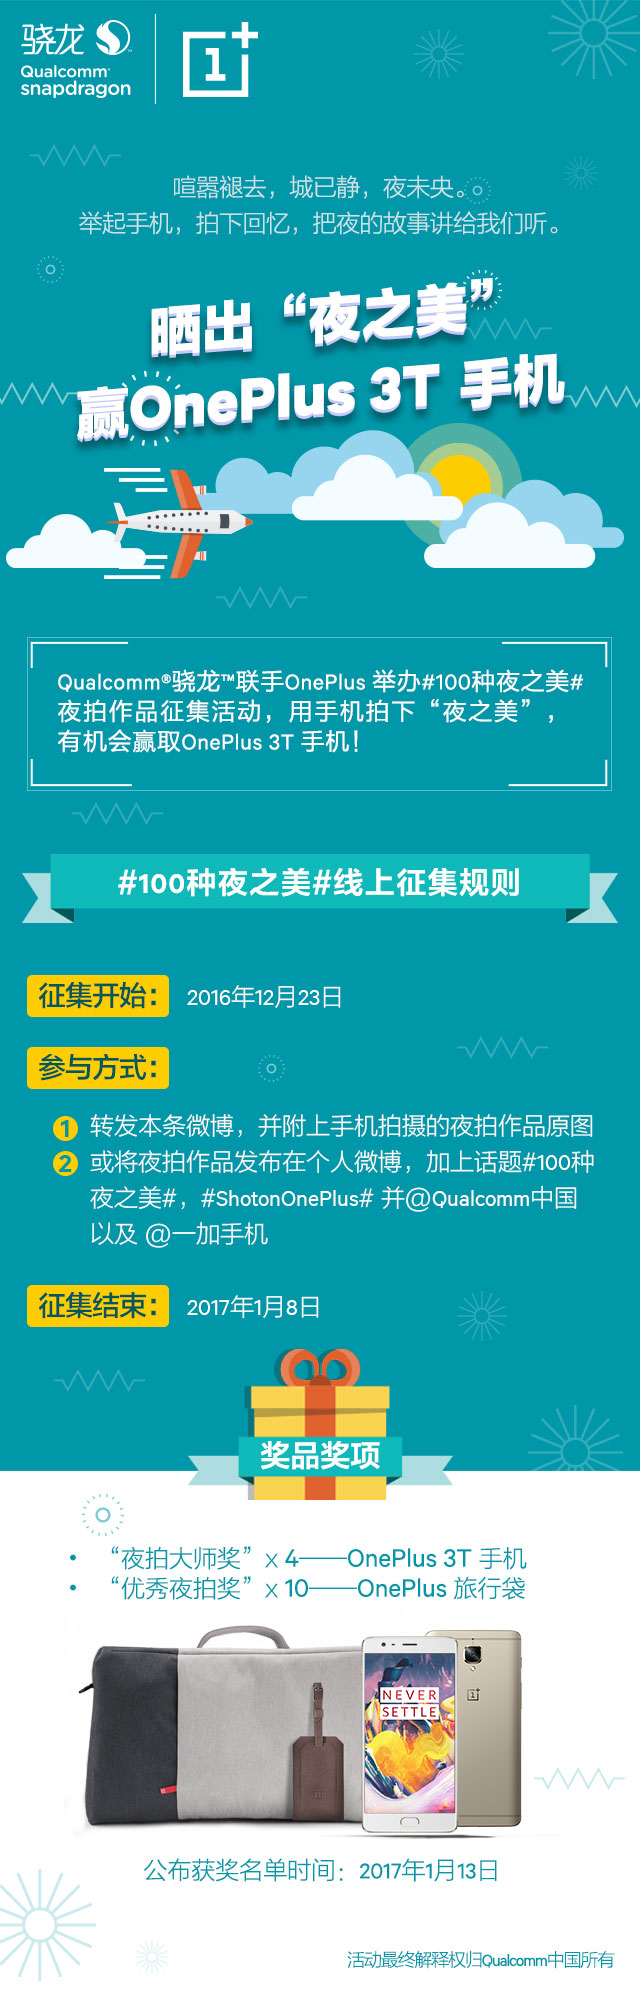 infographic活动规则.jpg